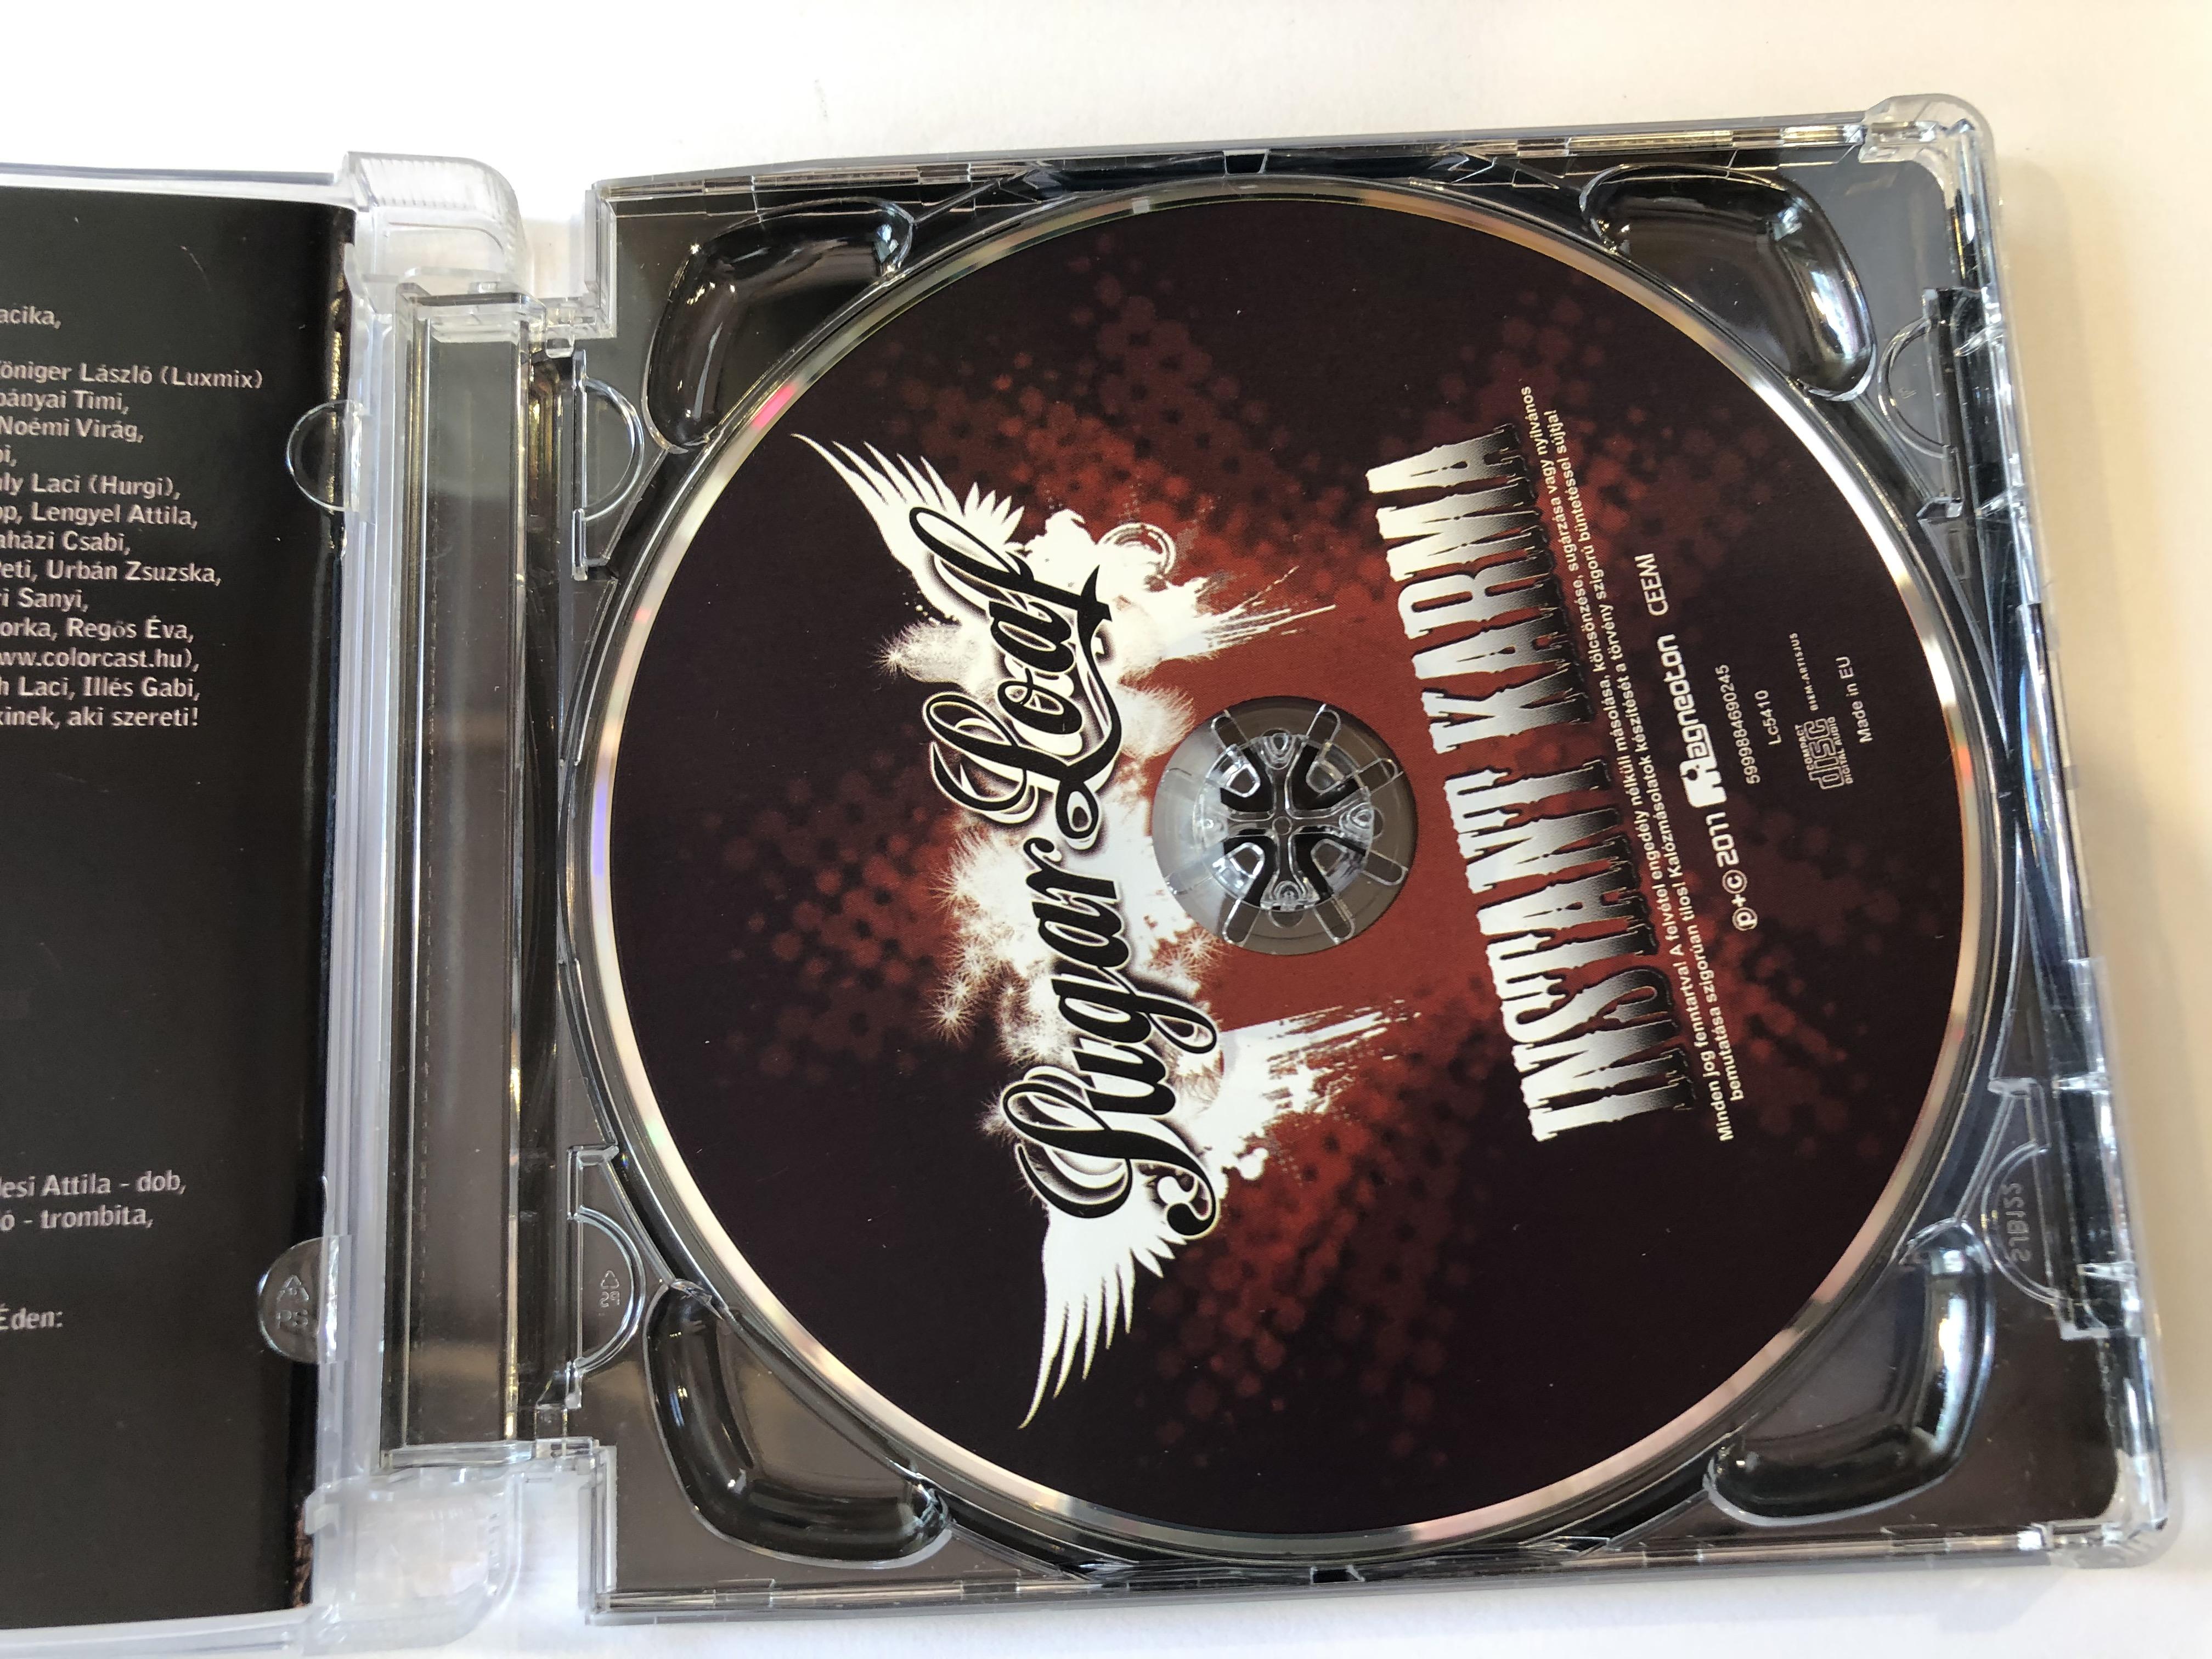 sugarloaf-instant-karma-magneoton-audio-cd-2011-5999884690245-2-.jpg